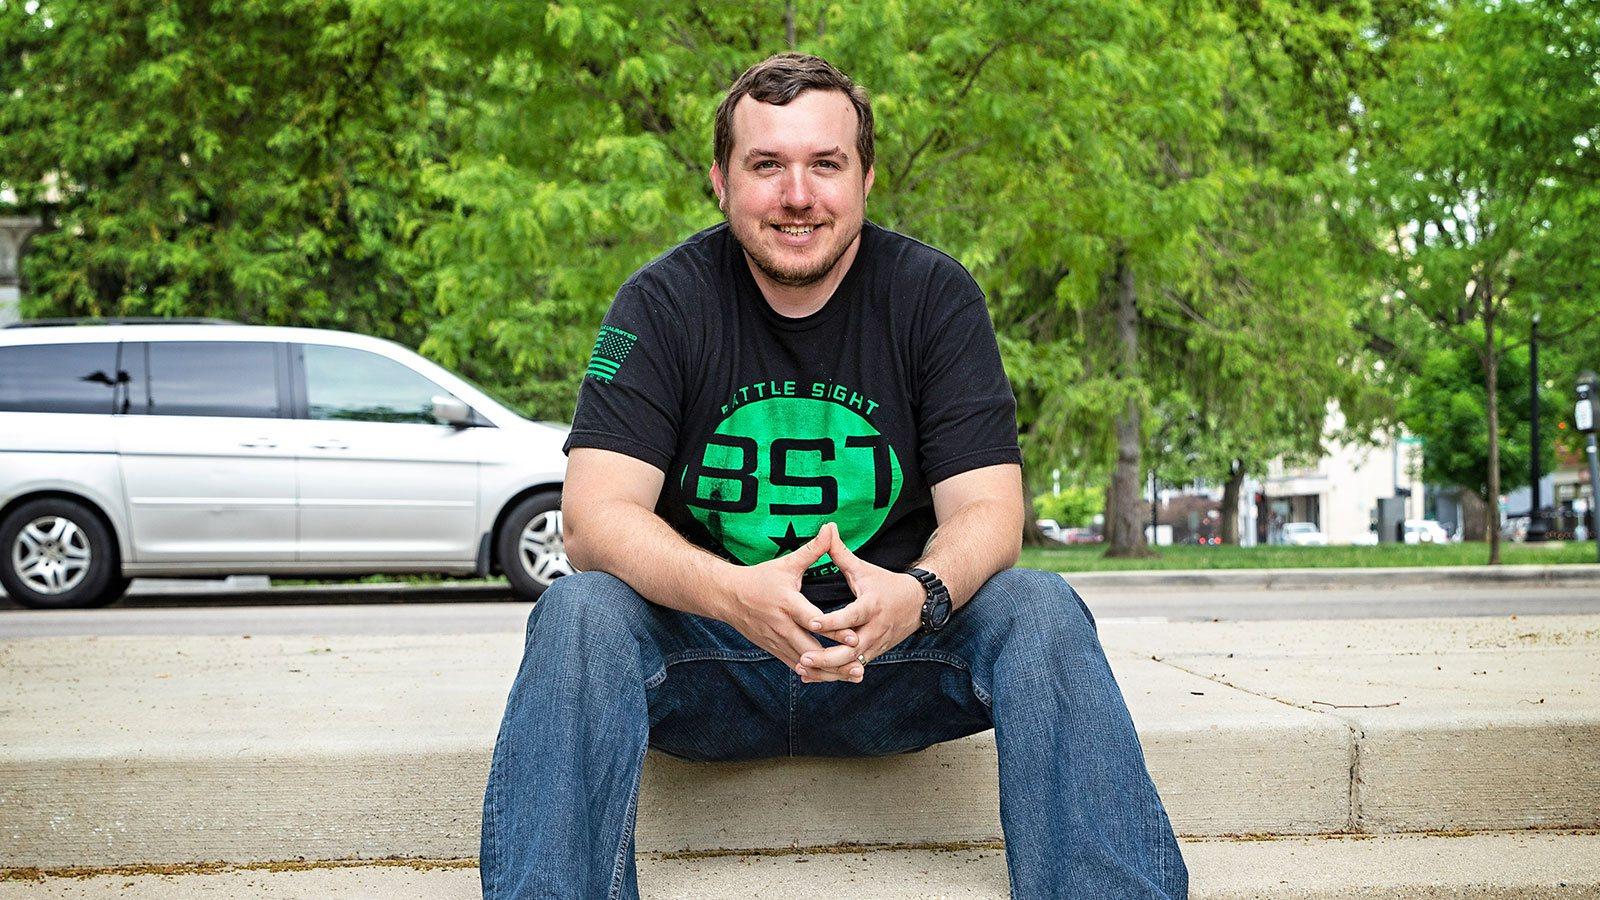 Battle Sigh Technologies founder and president Nick Ripplinger